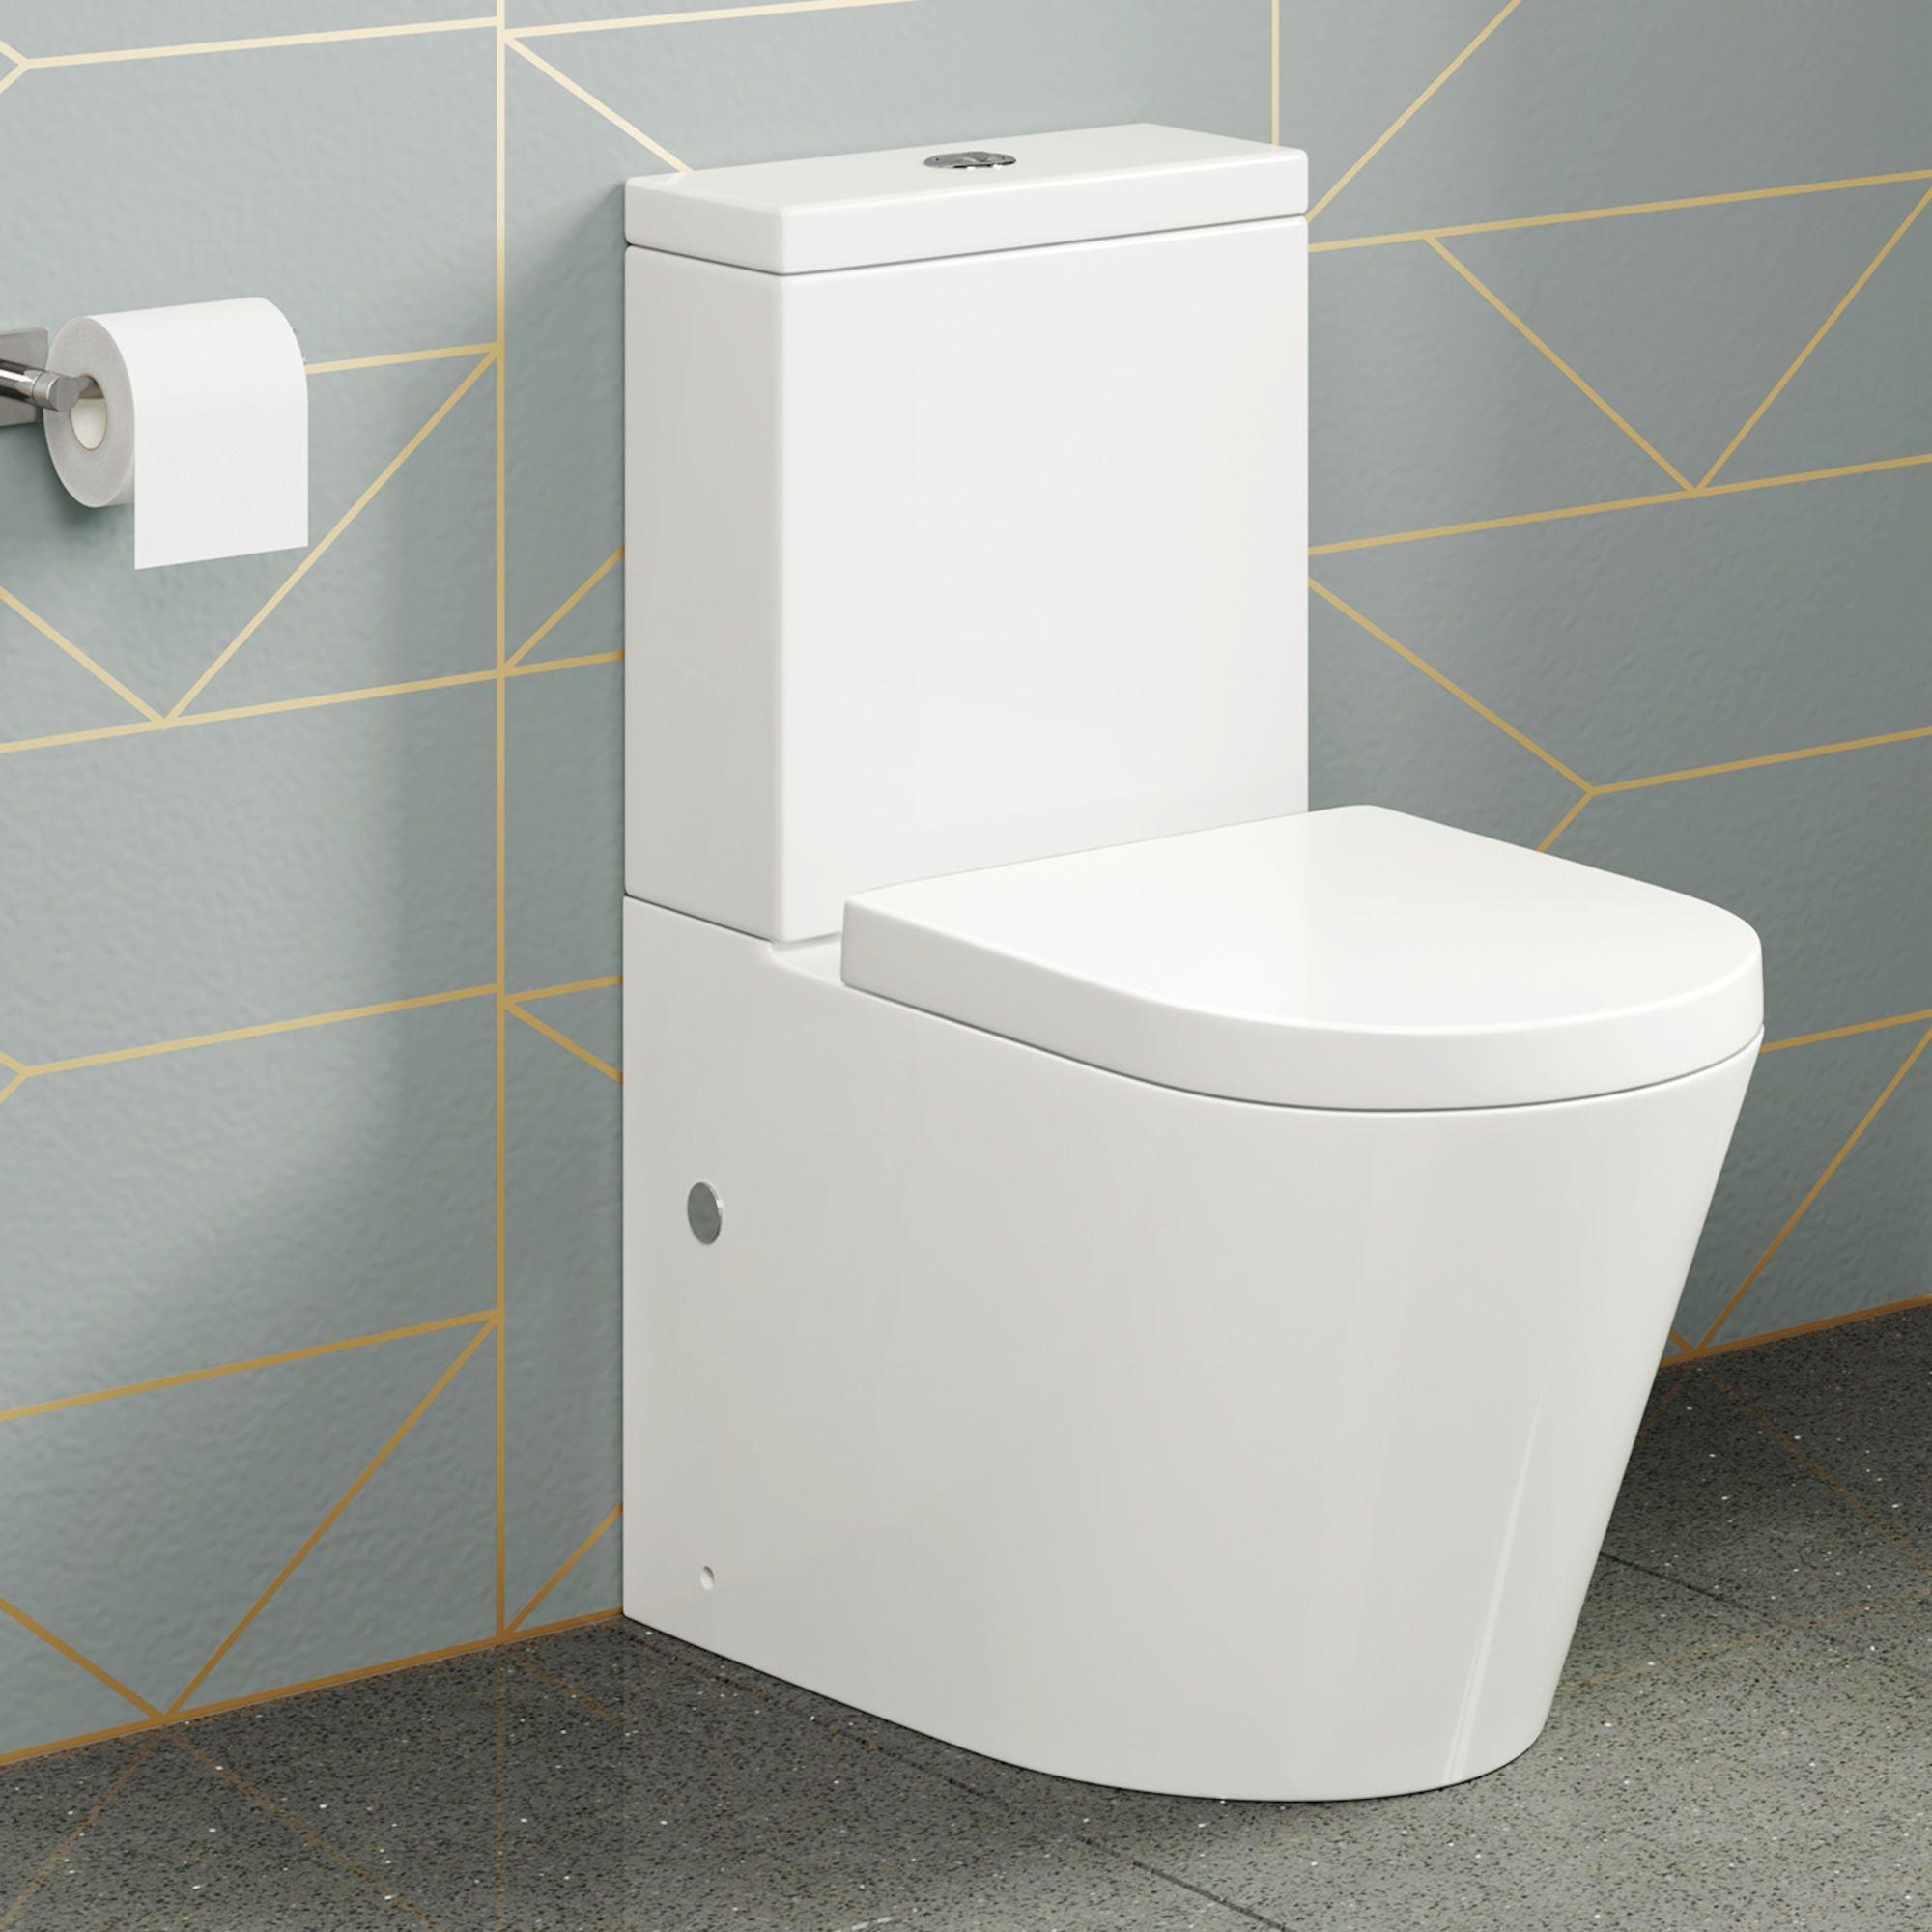 Lyon Ii Close Coupled Toilet Cistern Inc Luxury Soft Close Seat Toilet Spoelbak Toilet Ontwerp